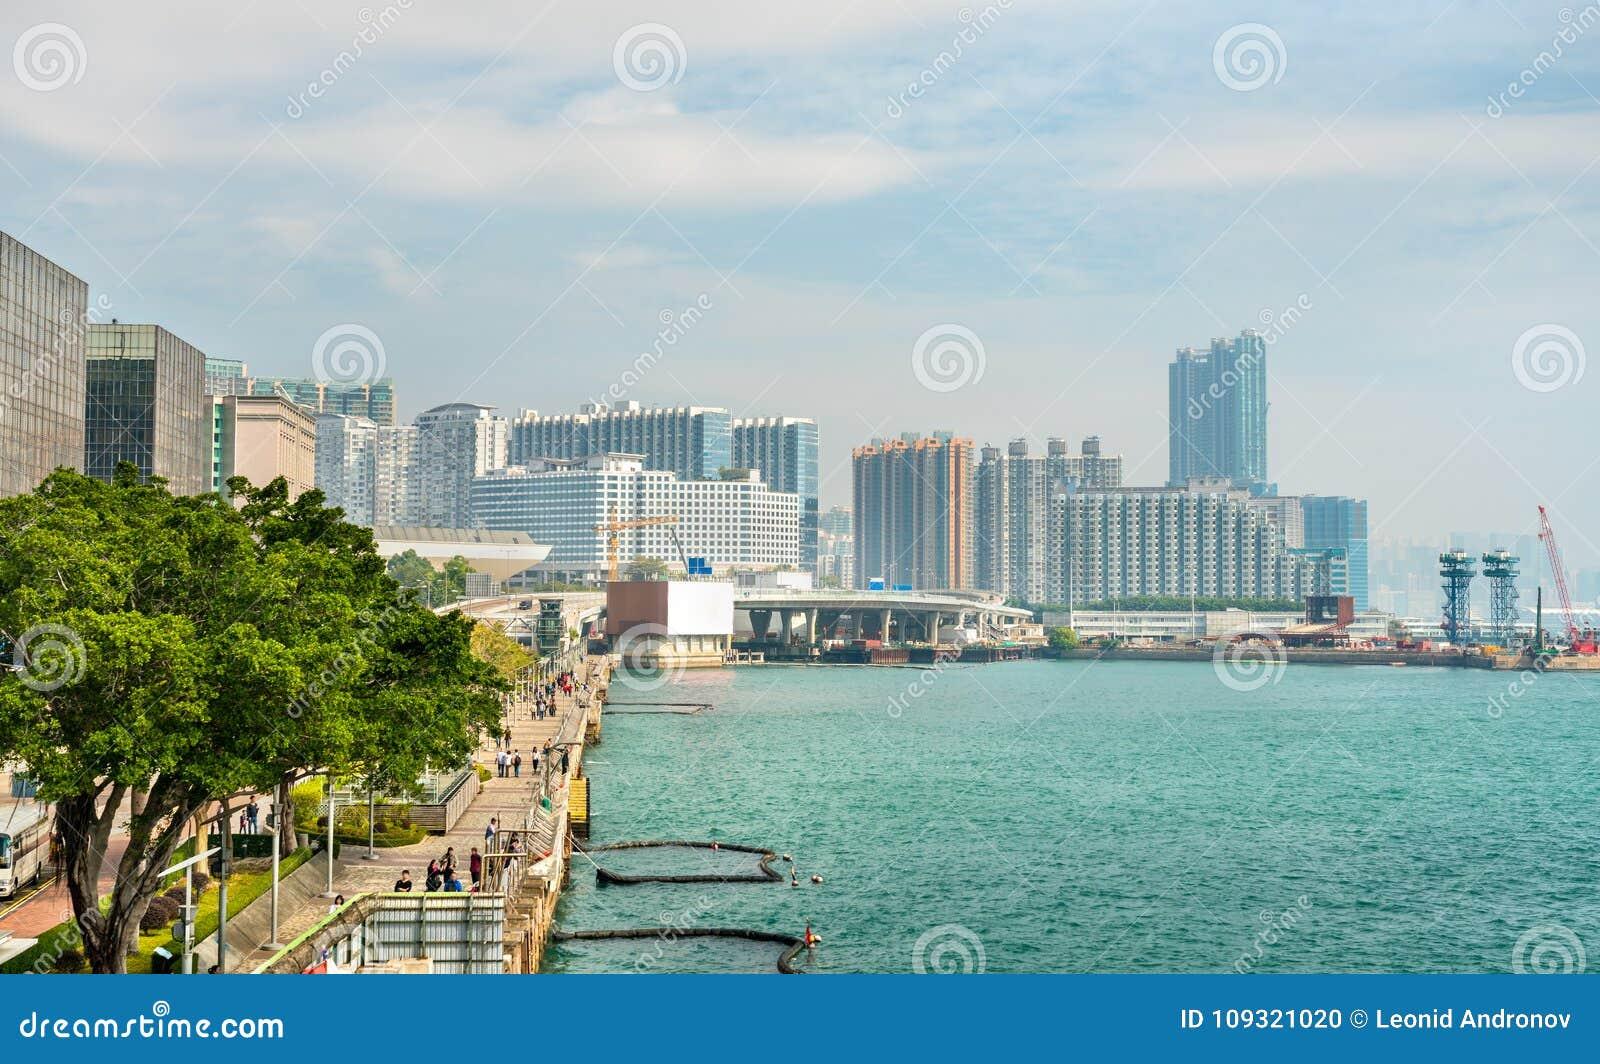 Vista ao longo do Tsim Sha Tsui Promenade em Hong Kong